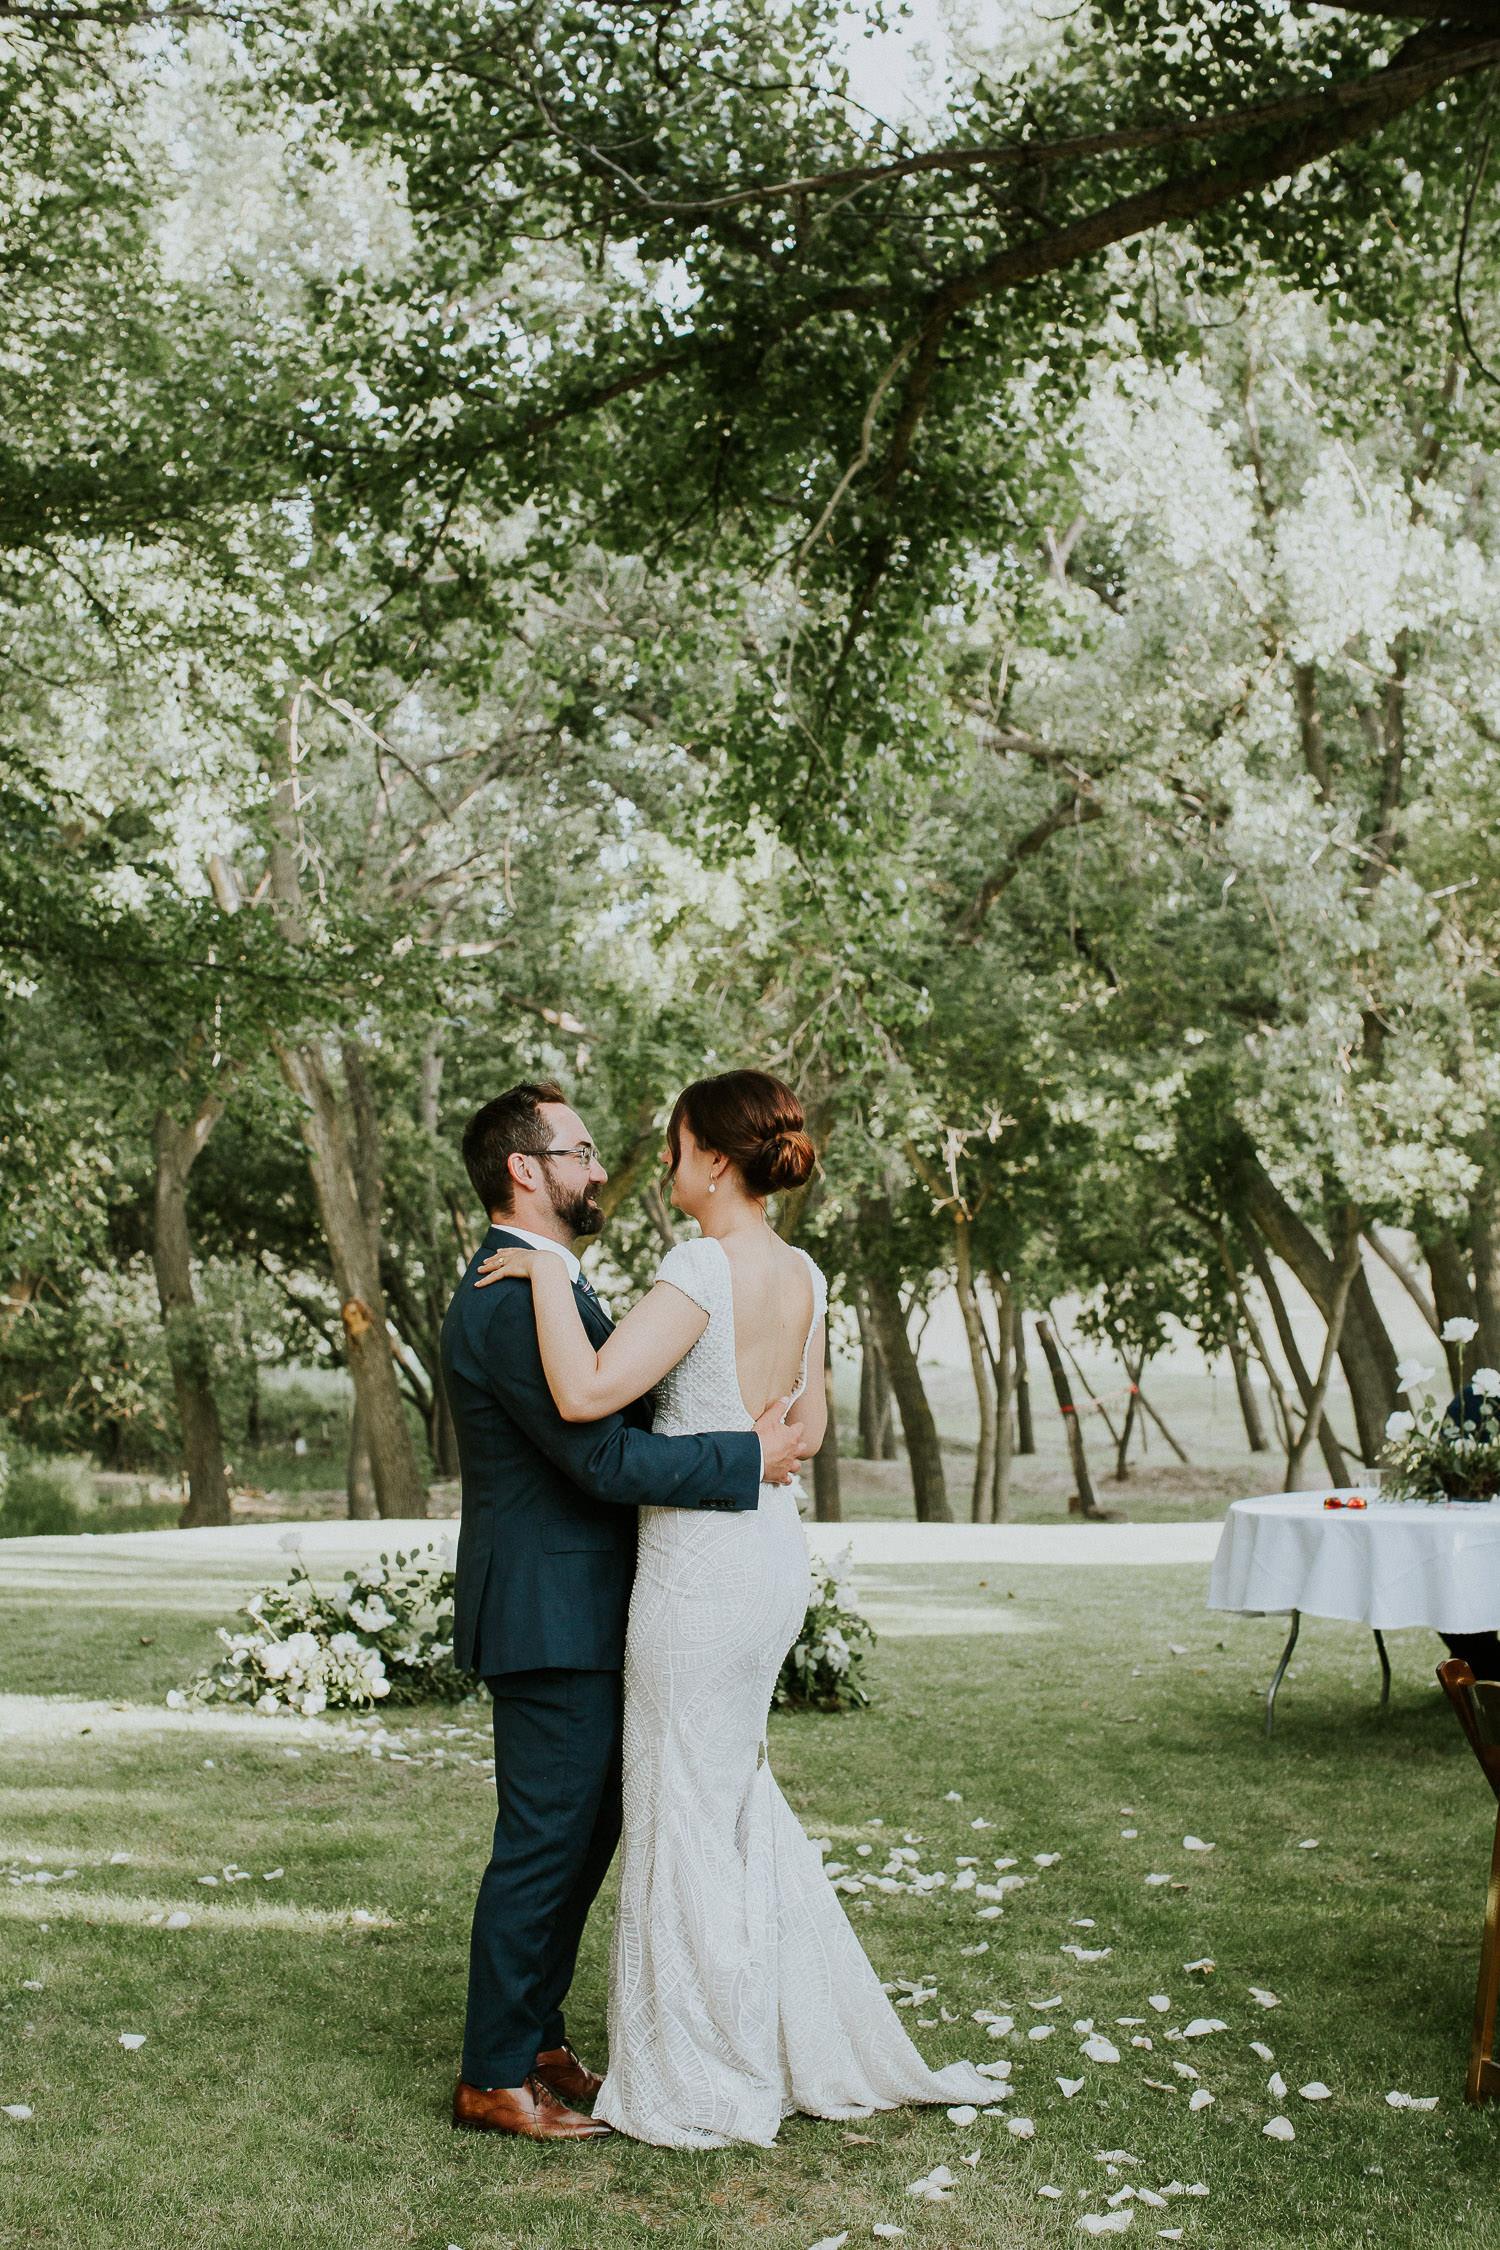 summer-backyard-wedding-in-alberta-sarah-pukin-0181